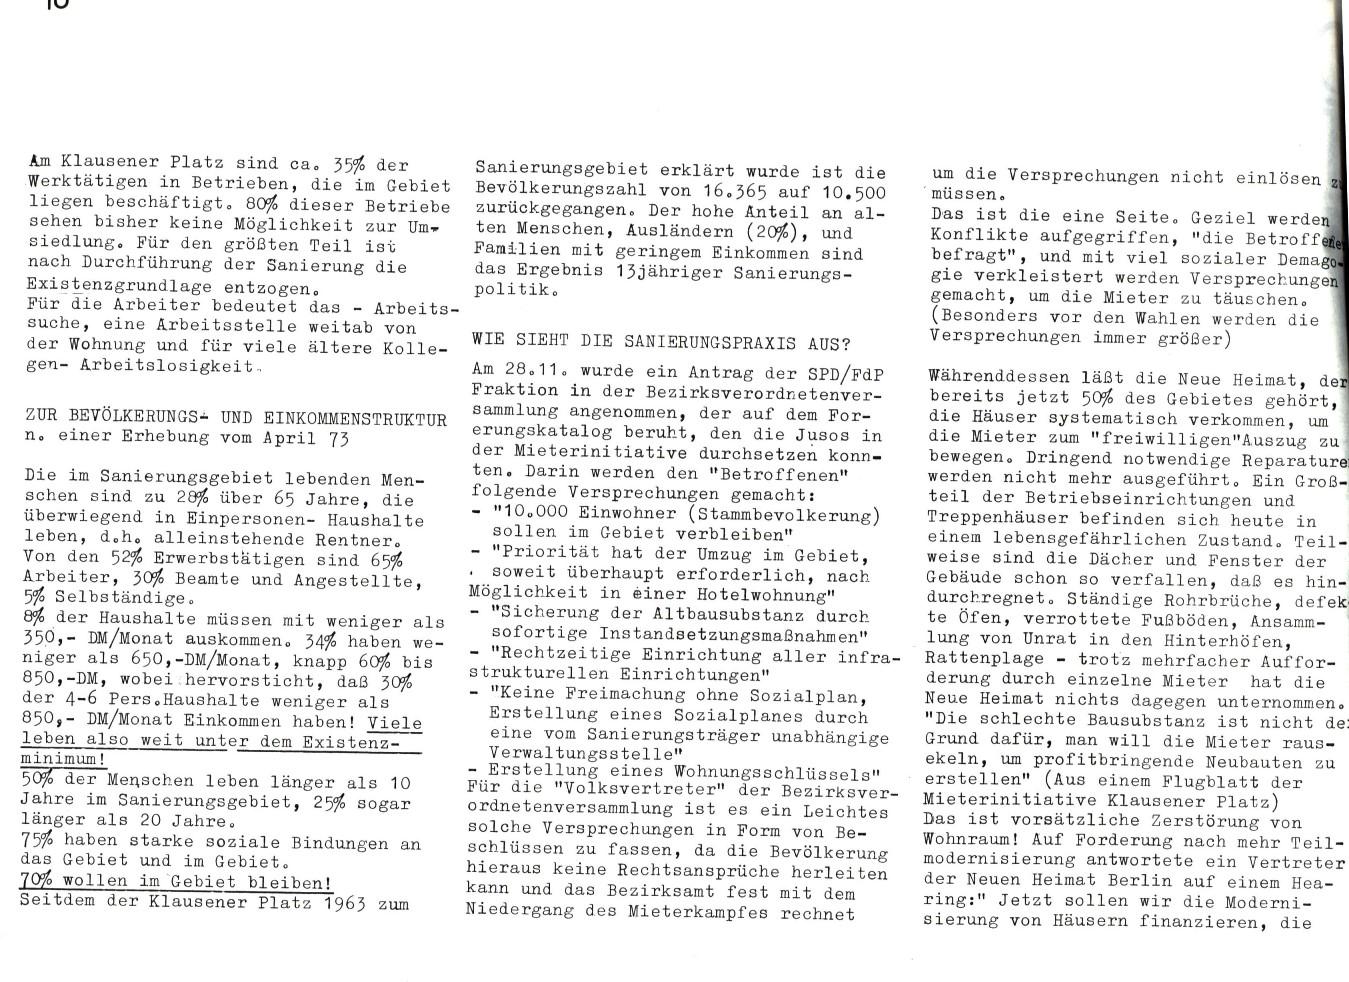 Berlin_KSV_1974_Rote_Bauwochen_18